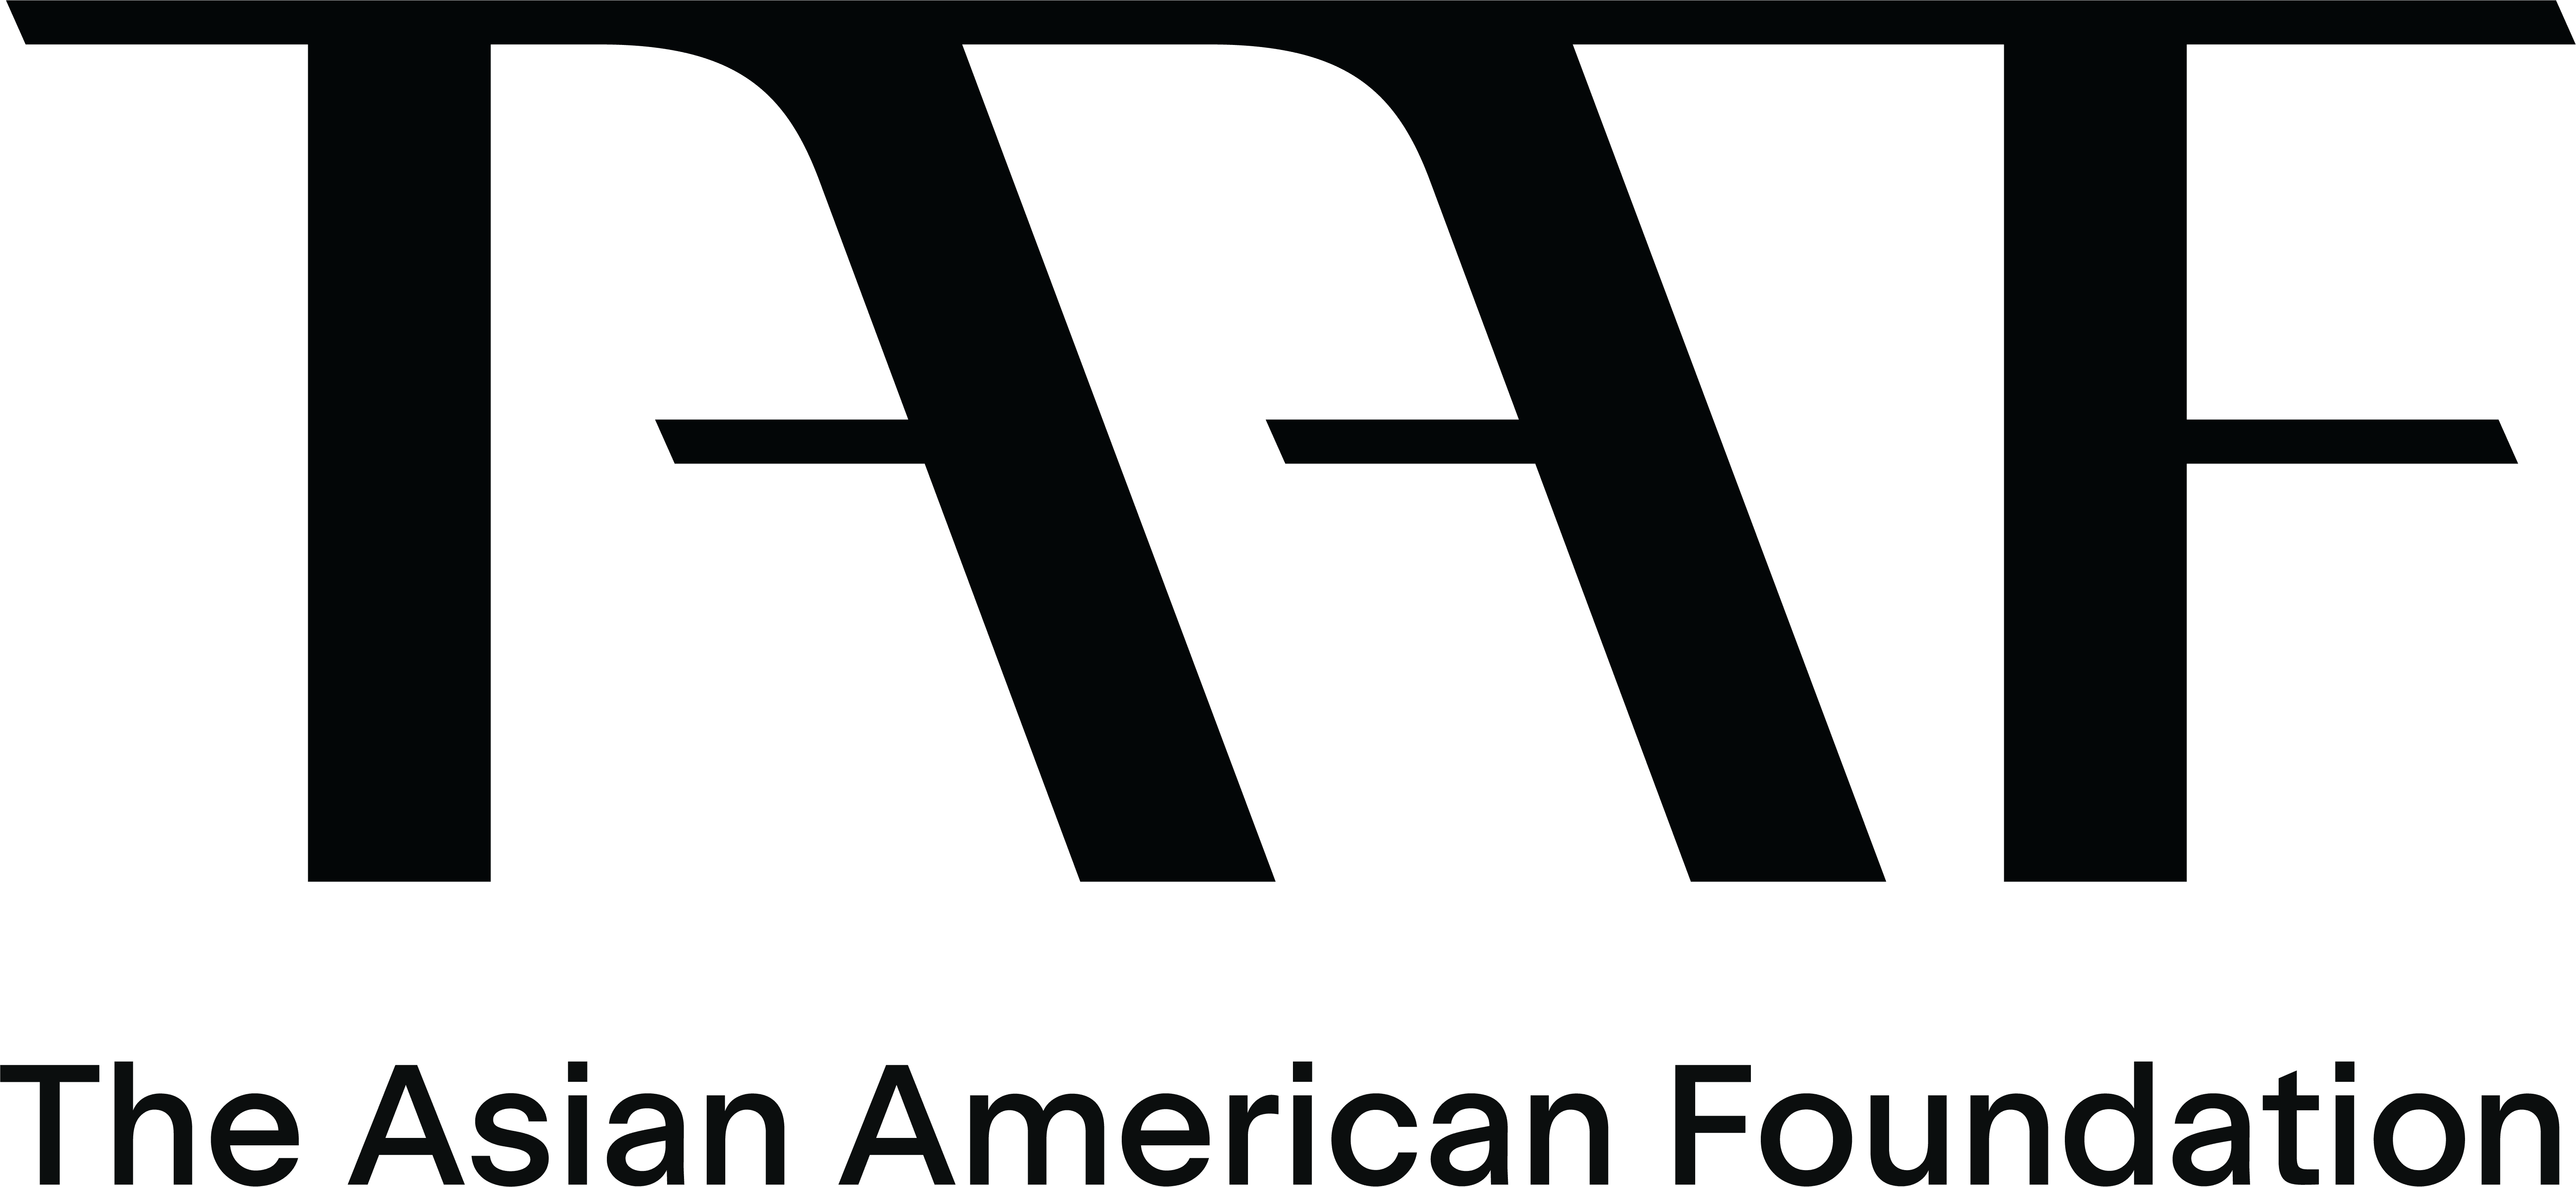 The Asian American Foundation logo